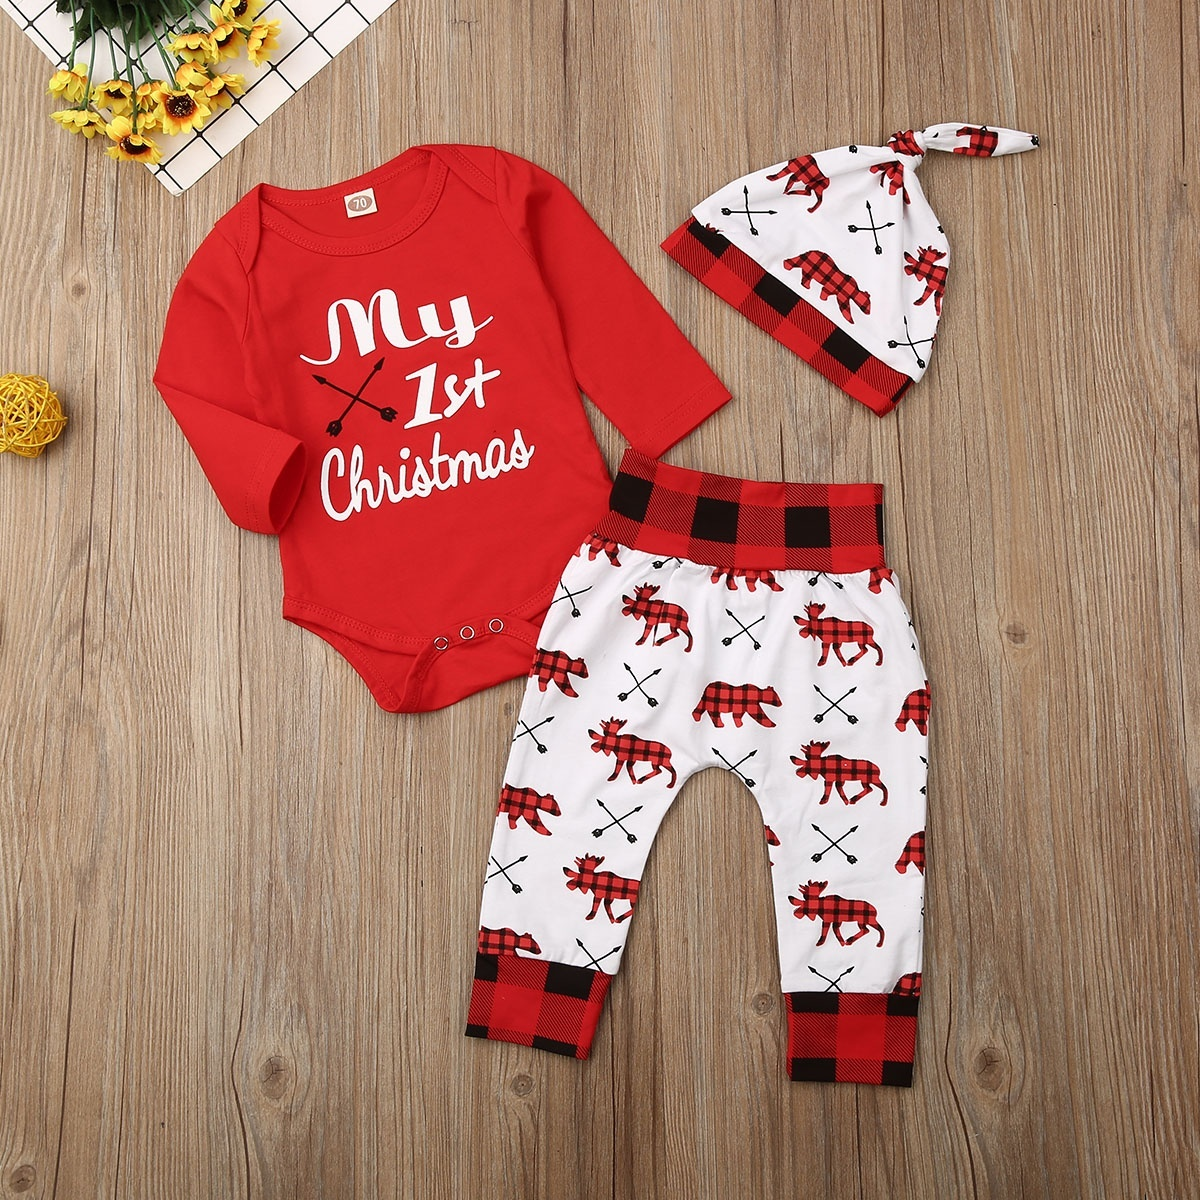 Christmas Baby Girl Boy Outfit Long Sleeve Romper Bodysuit Onesies for Christmaswith Deer Head Print Bodysuit+Pant+Hat 3pc Set